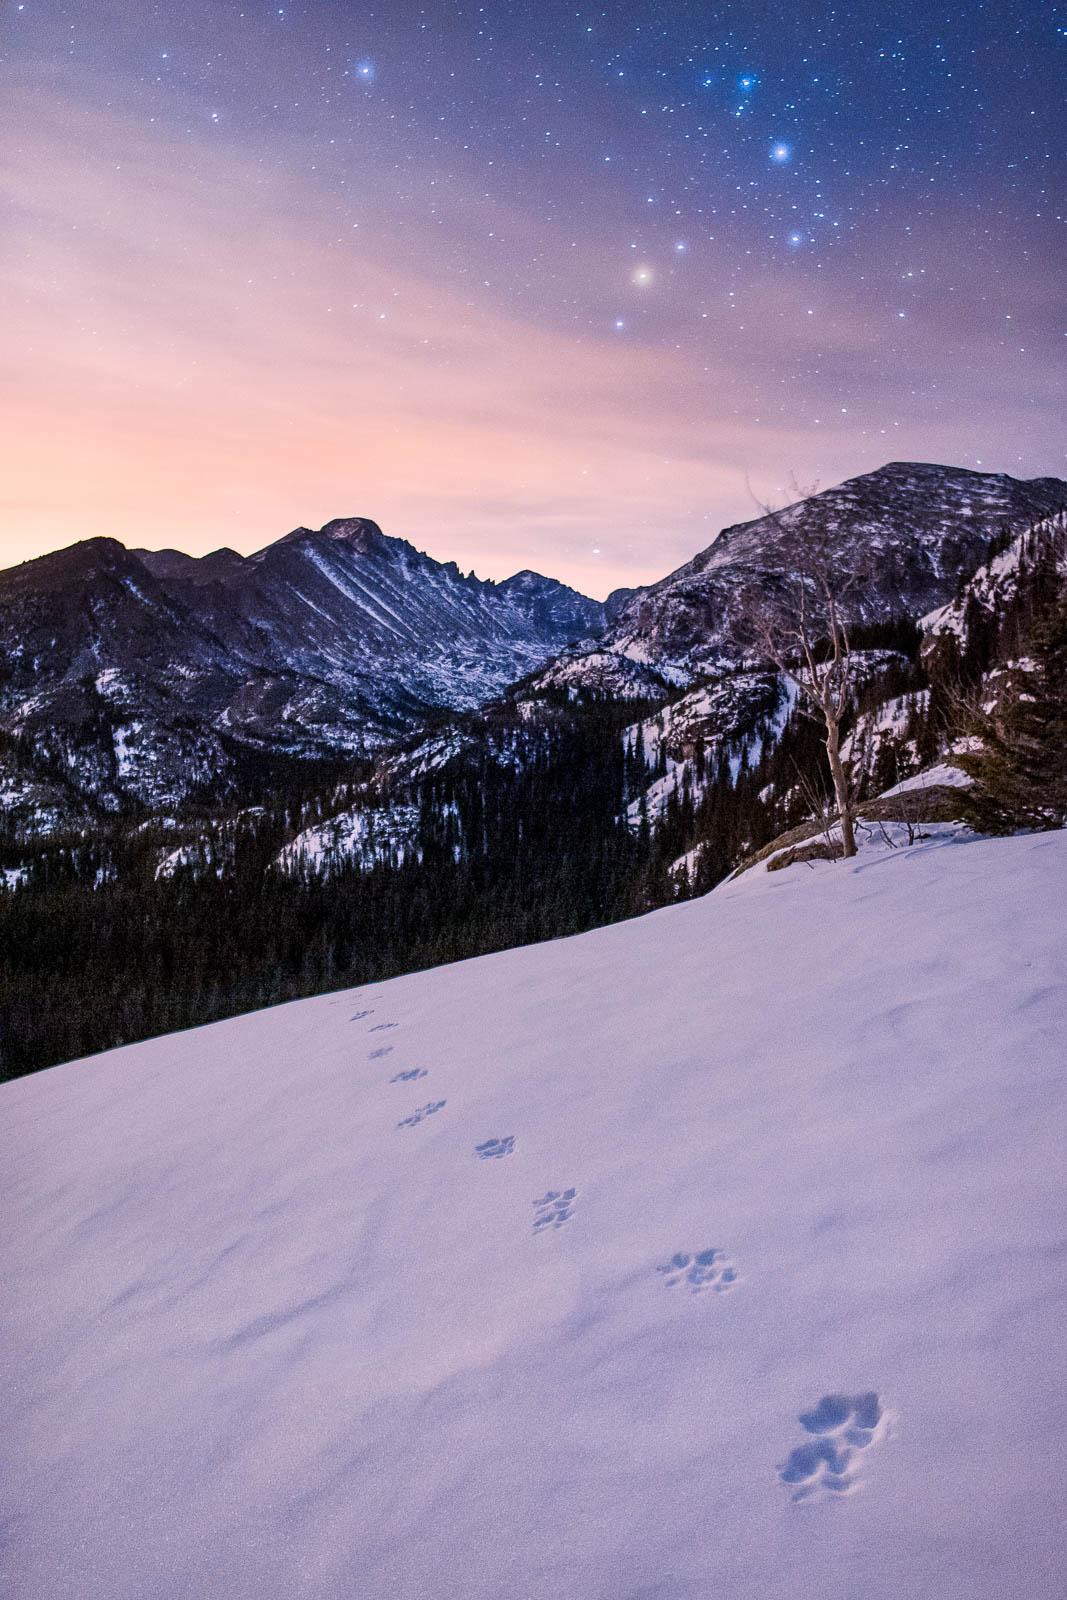 Night, Time, blue, clouds, colorado, longs peak, portrait orientation, purple, rmnp, rocky mountain national park, rocky mountains...